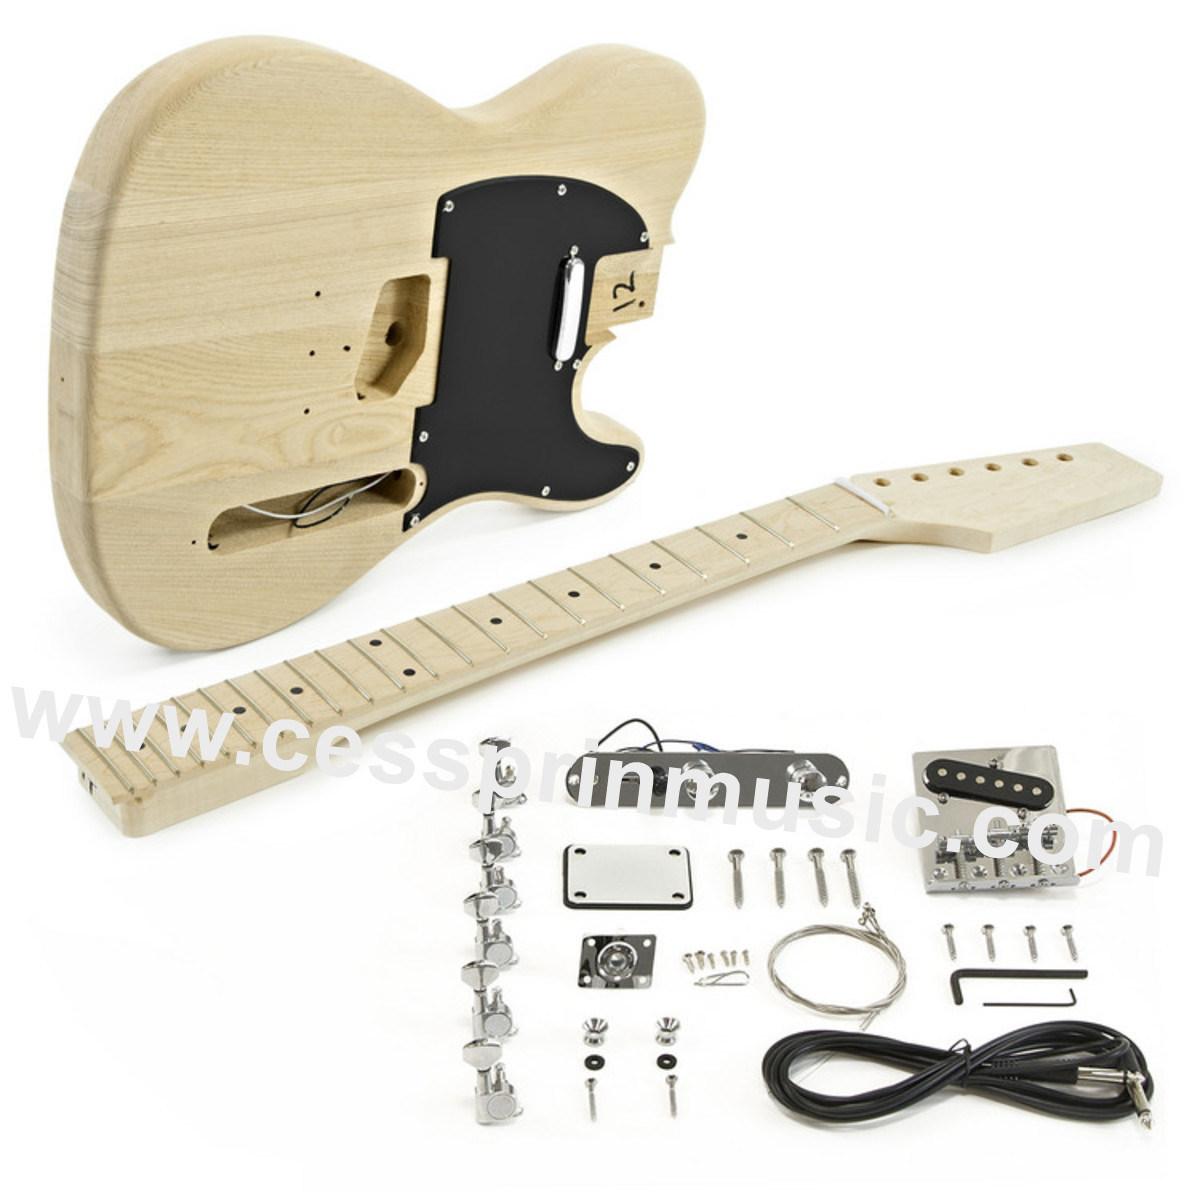 DIY Electric Guitar/ Guitar Kits /Lp Style/Guitar/ Manufacturer/Cessprin Music (CPGK007)